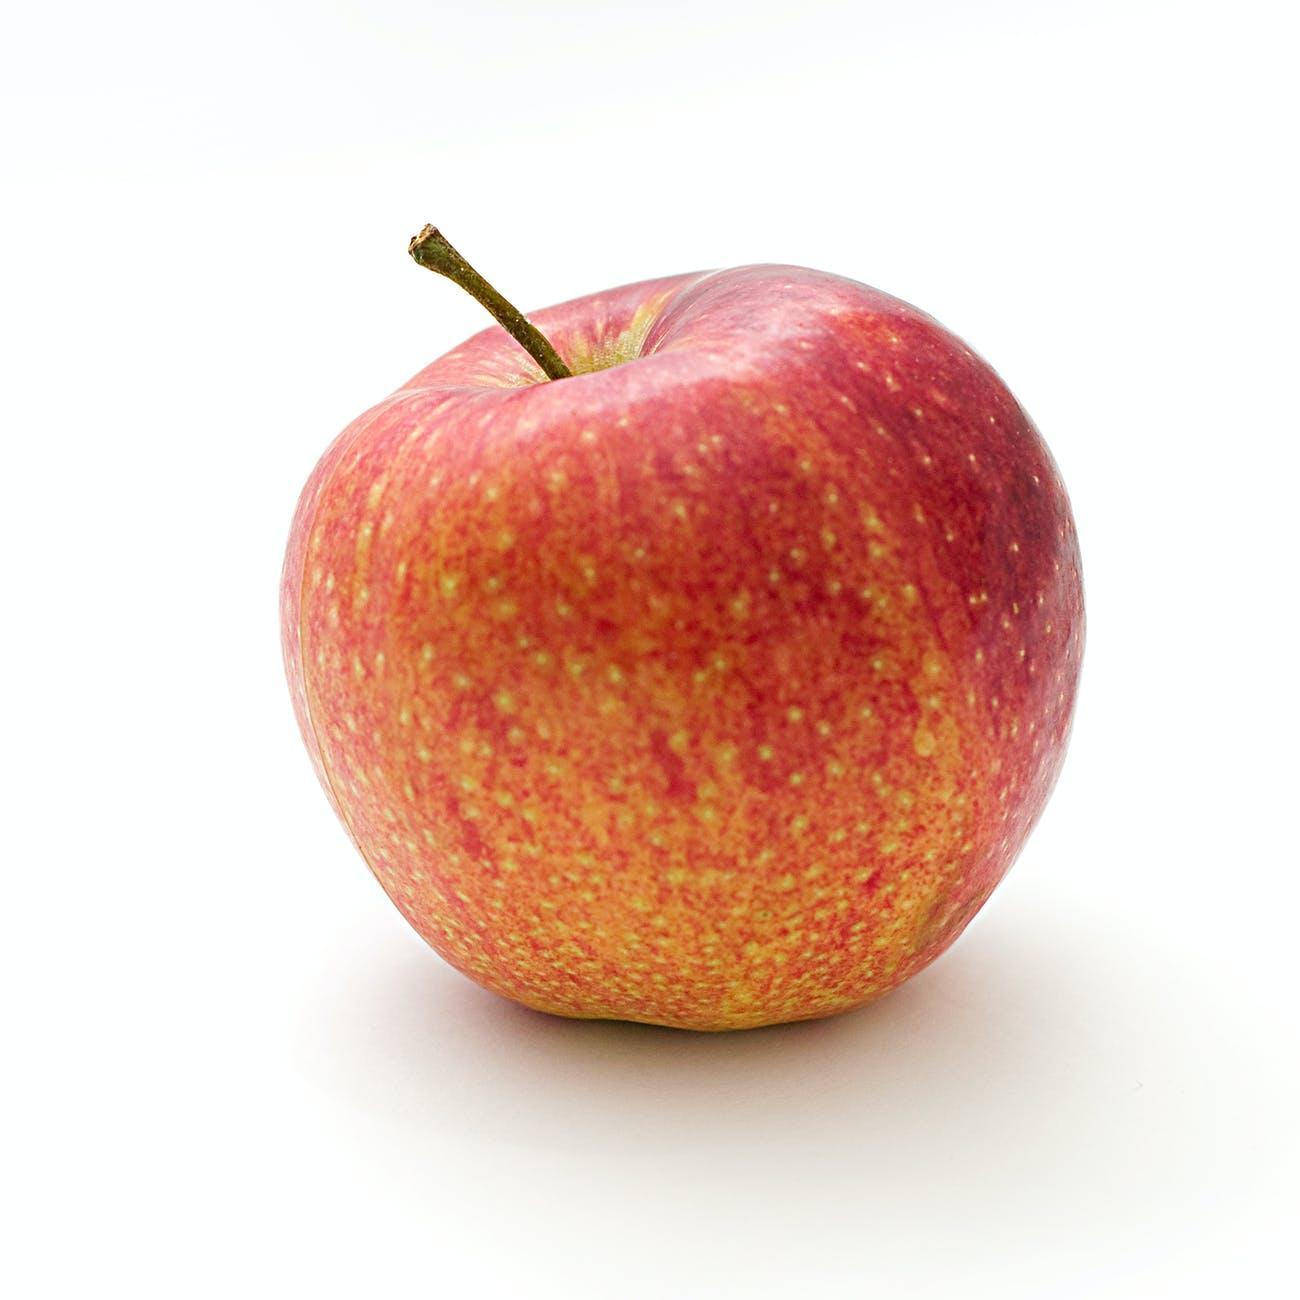 red and orange apple fruit